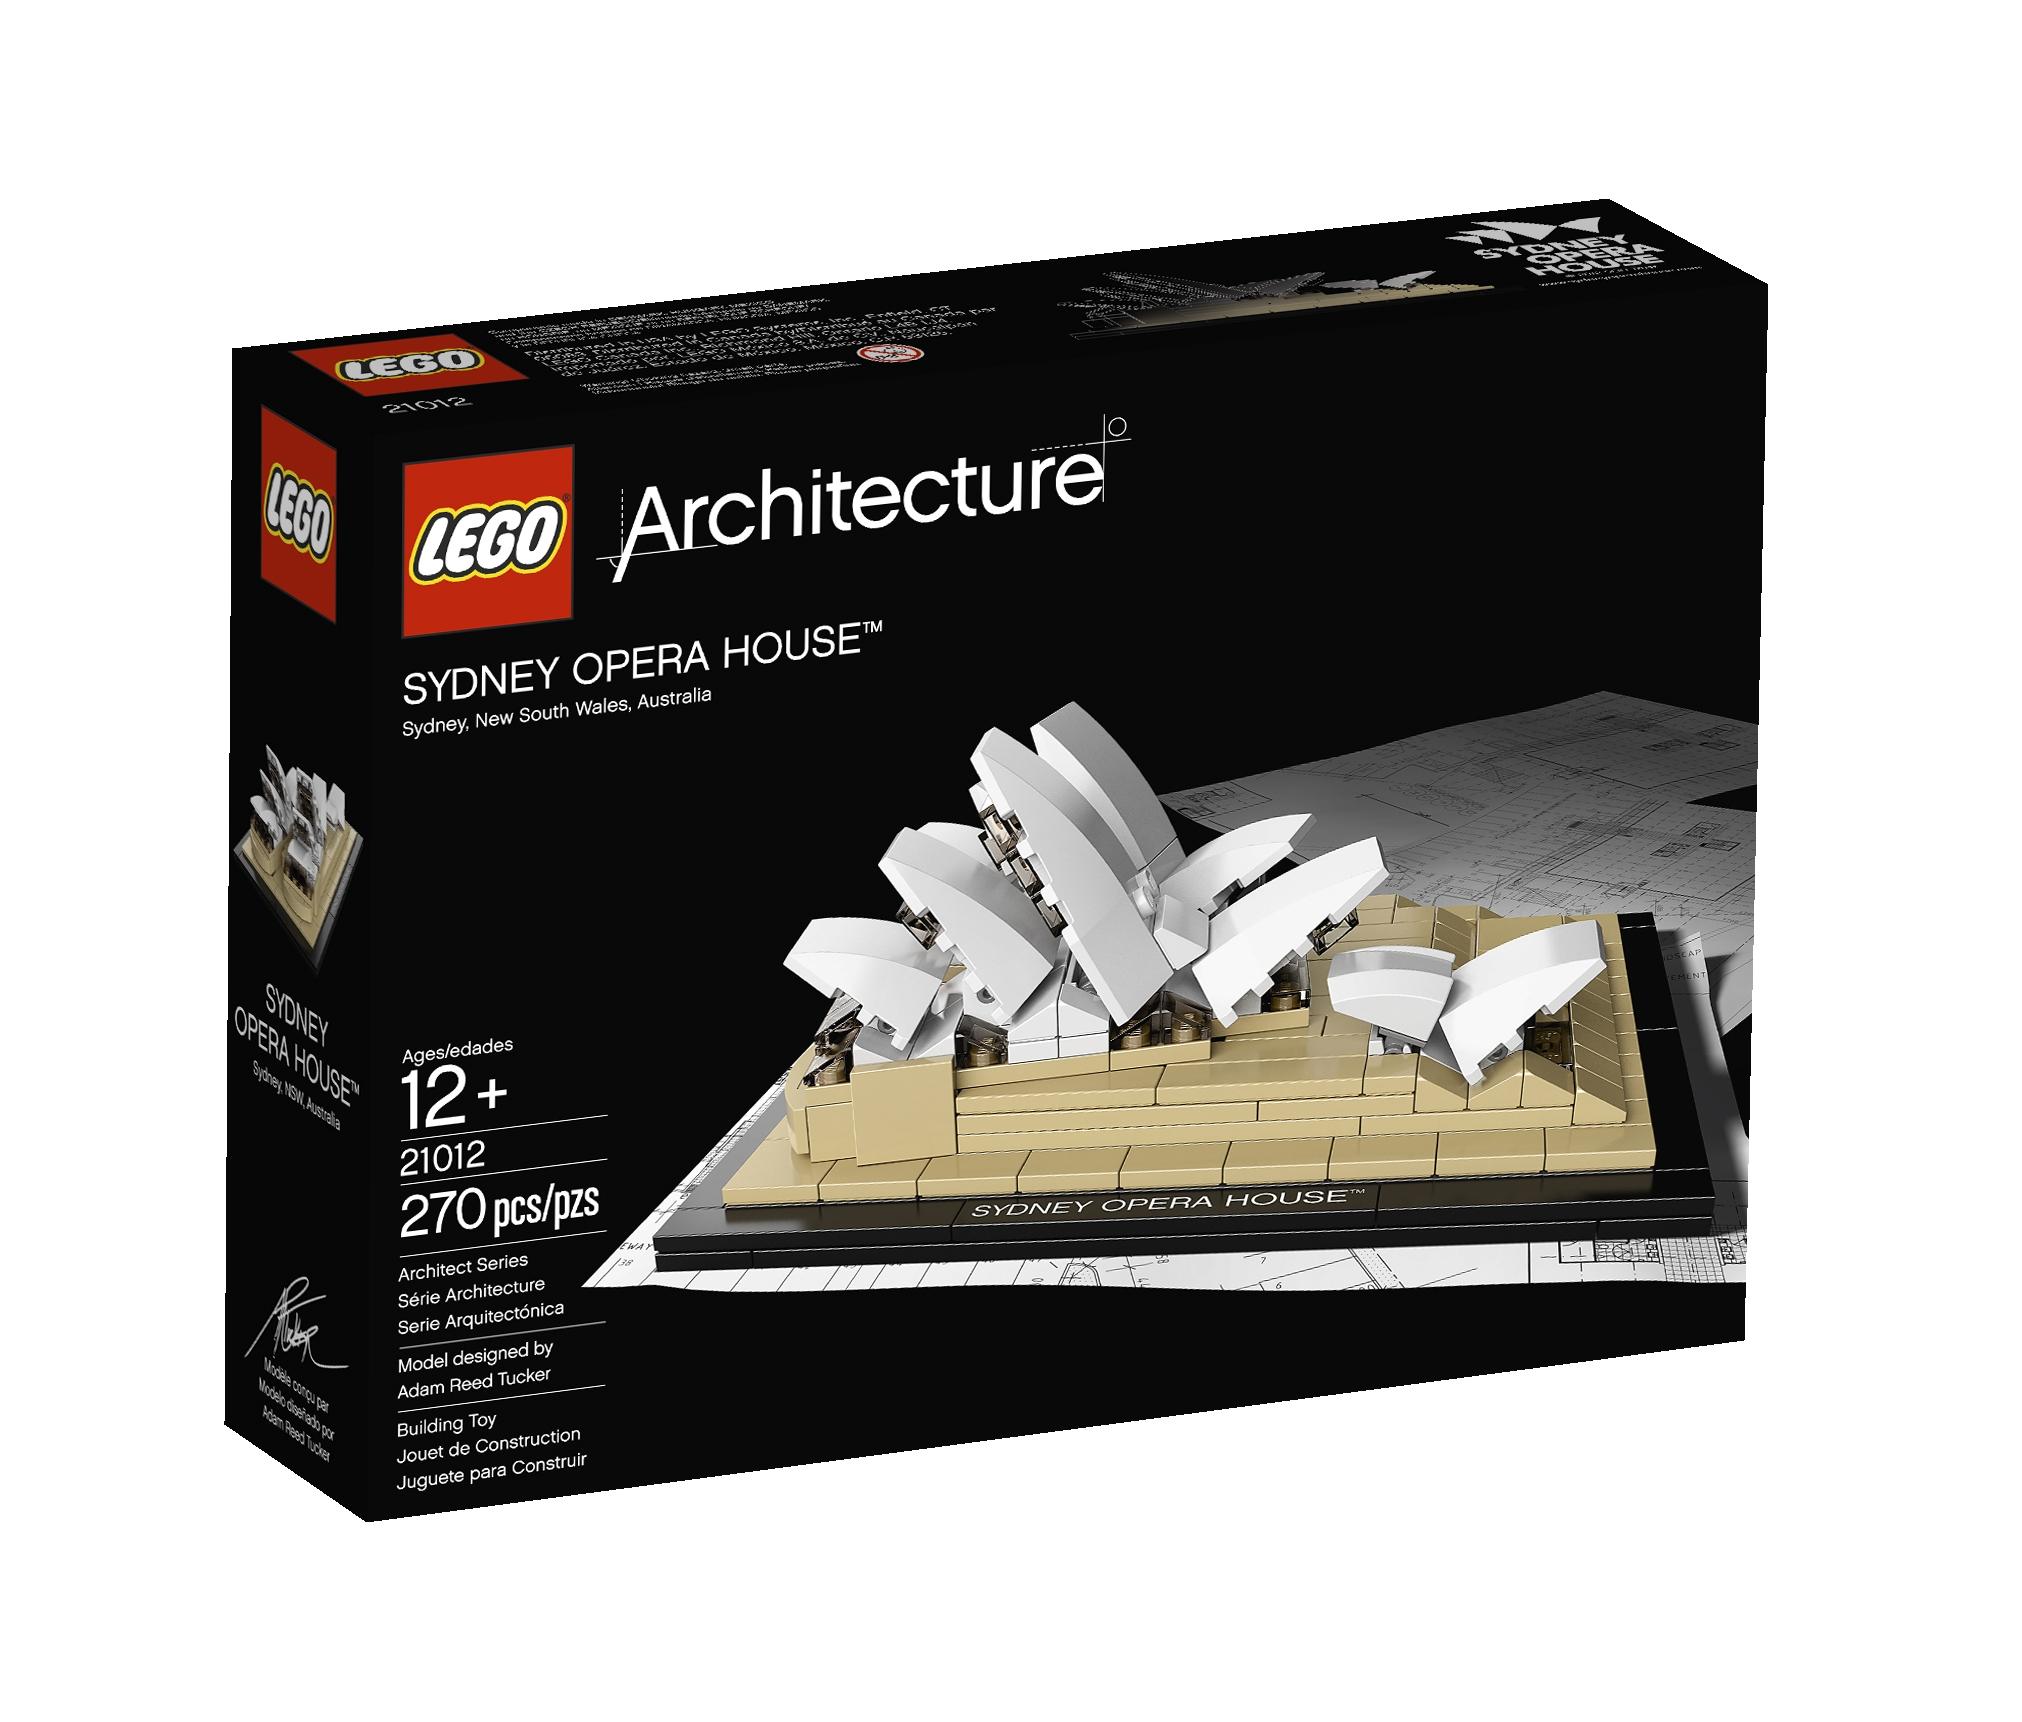 Novo LEGO® Architecture Series: Ópera de Sydney de Jørn Utzon, LEGO®